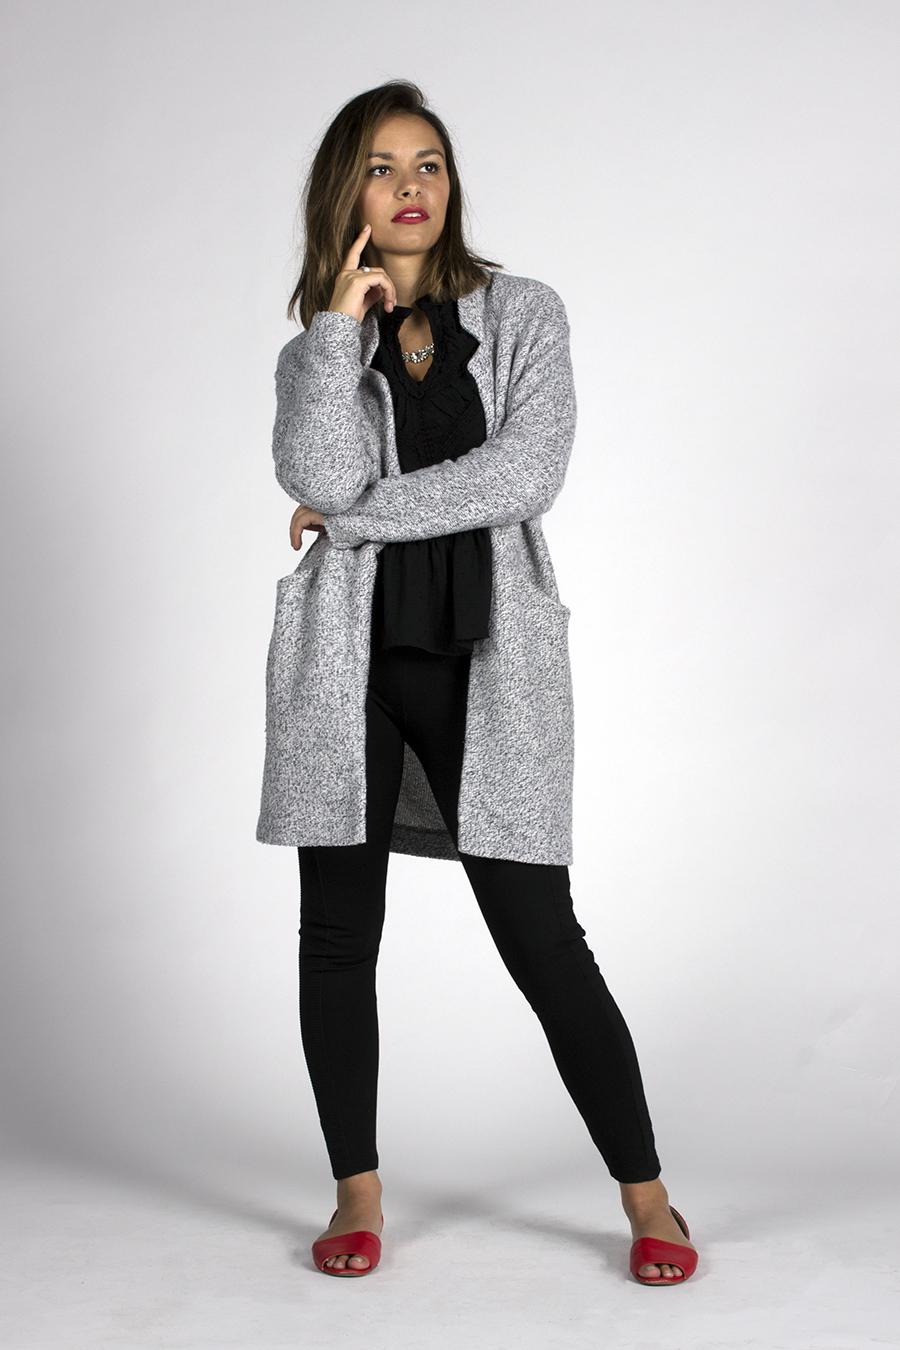 Sharon_Song_fashion_photography_millenial_professional_dres_Tony_Ward_Studio_women_sweater